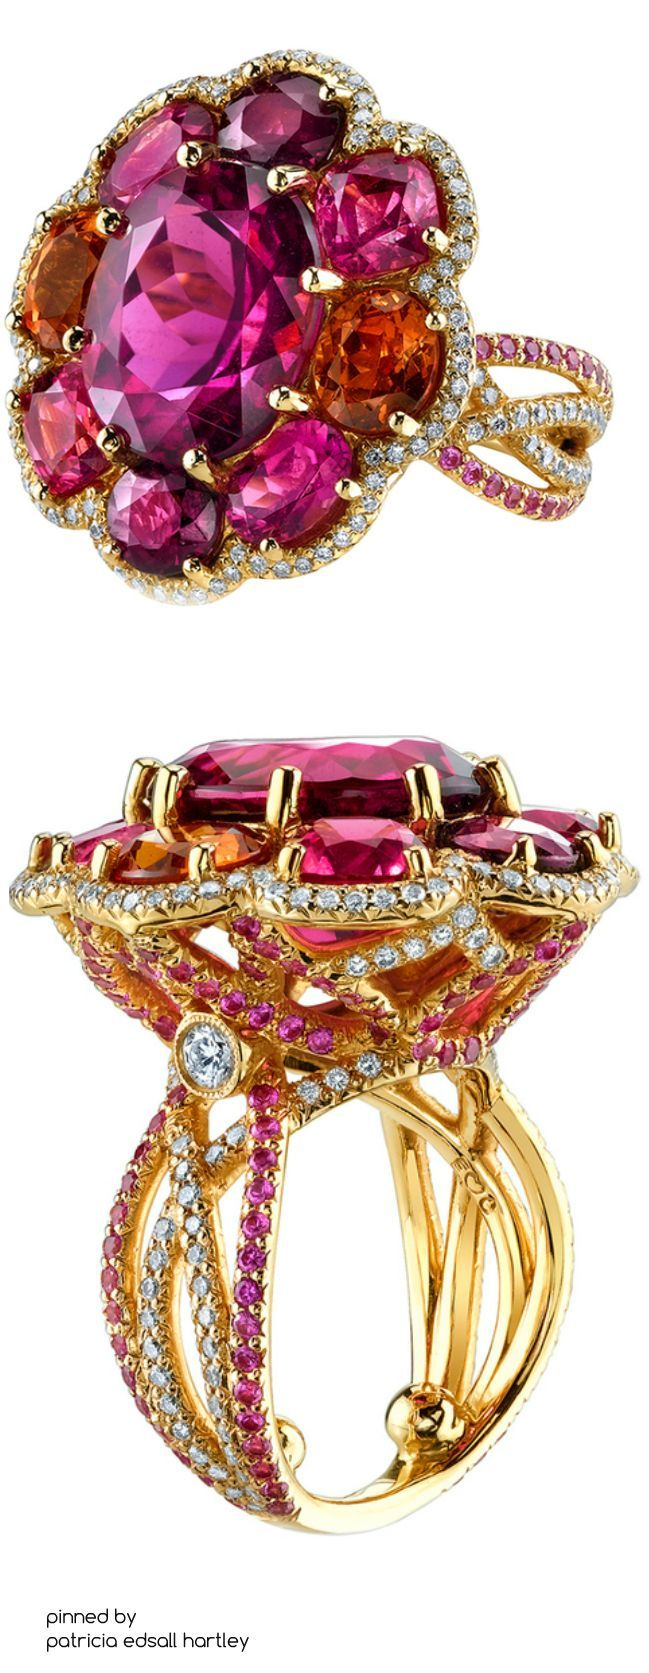 Flower Mosiac Ring